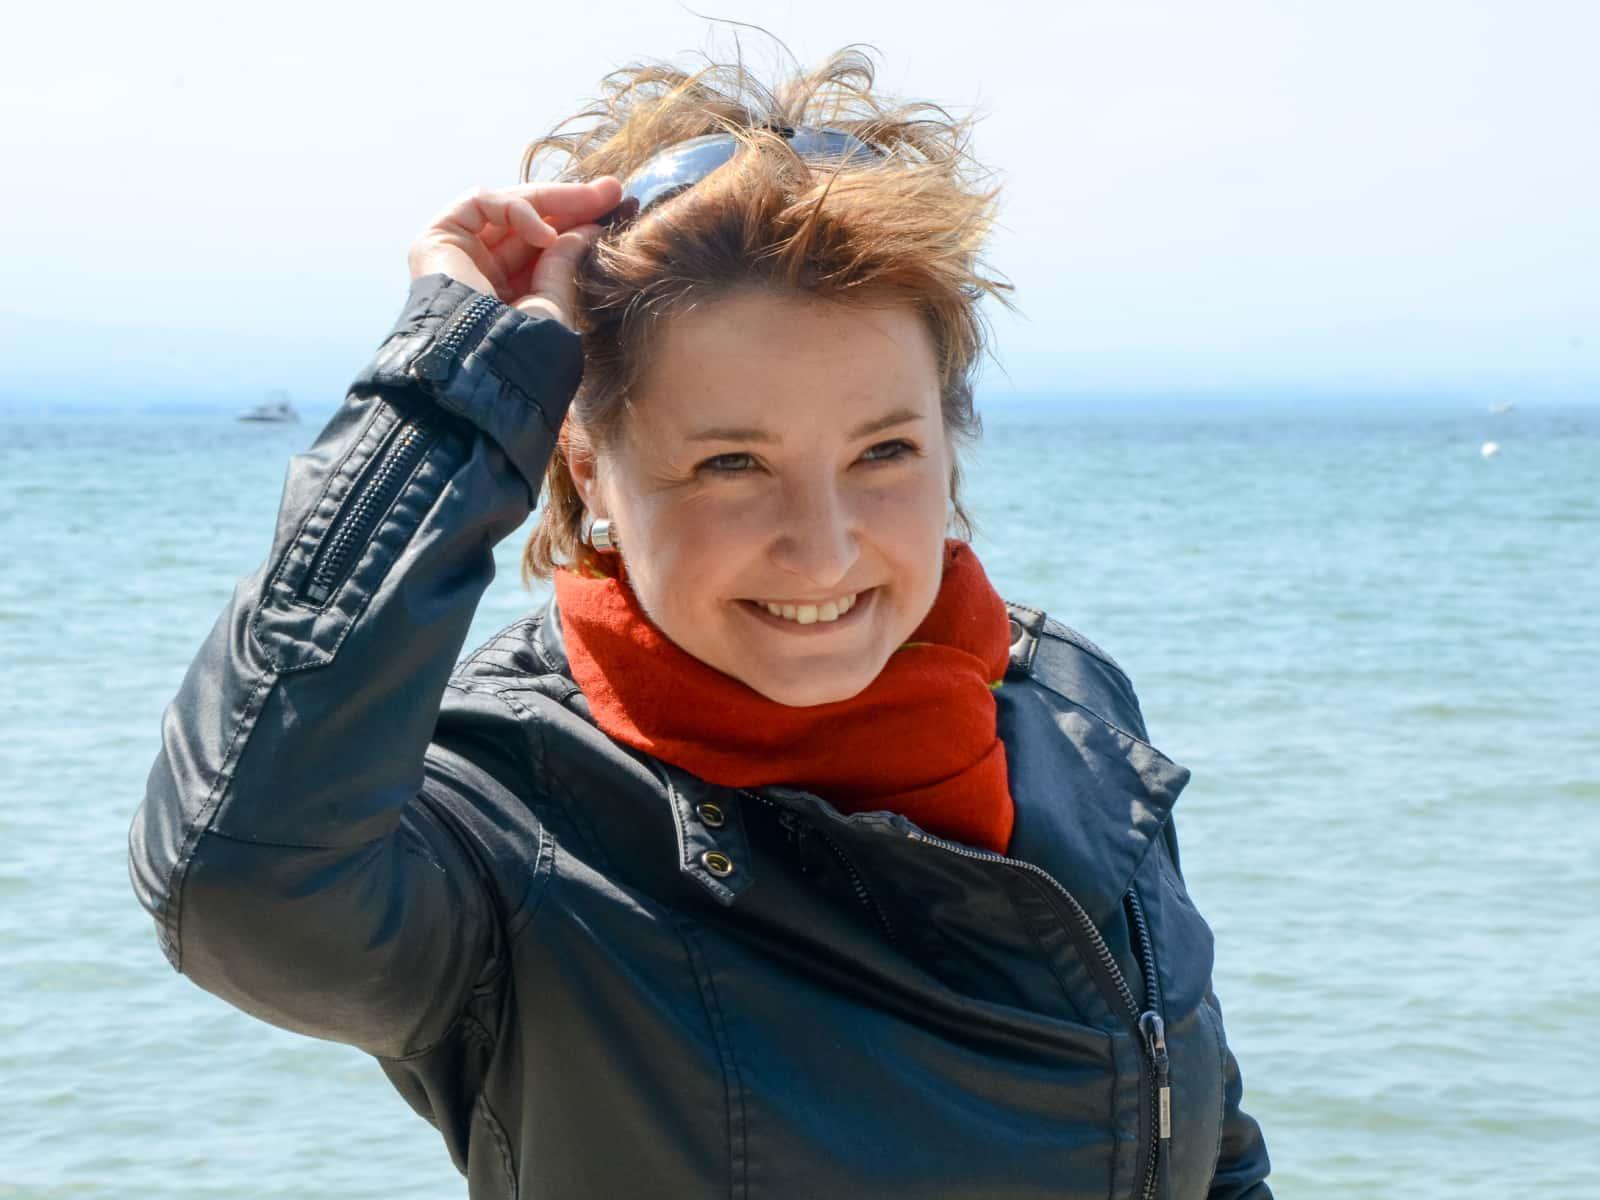 Julia from Frankfurt am Main, Germany